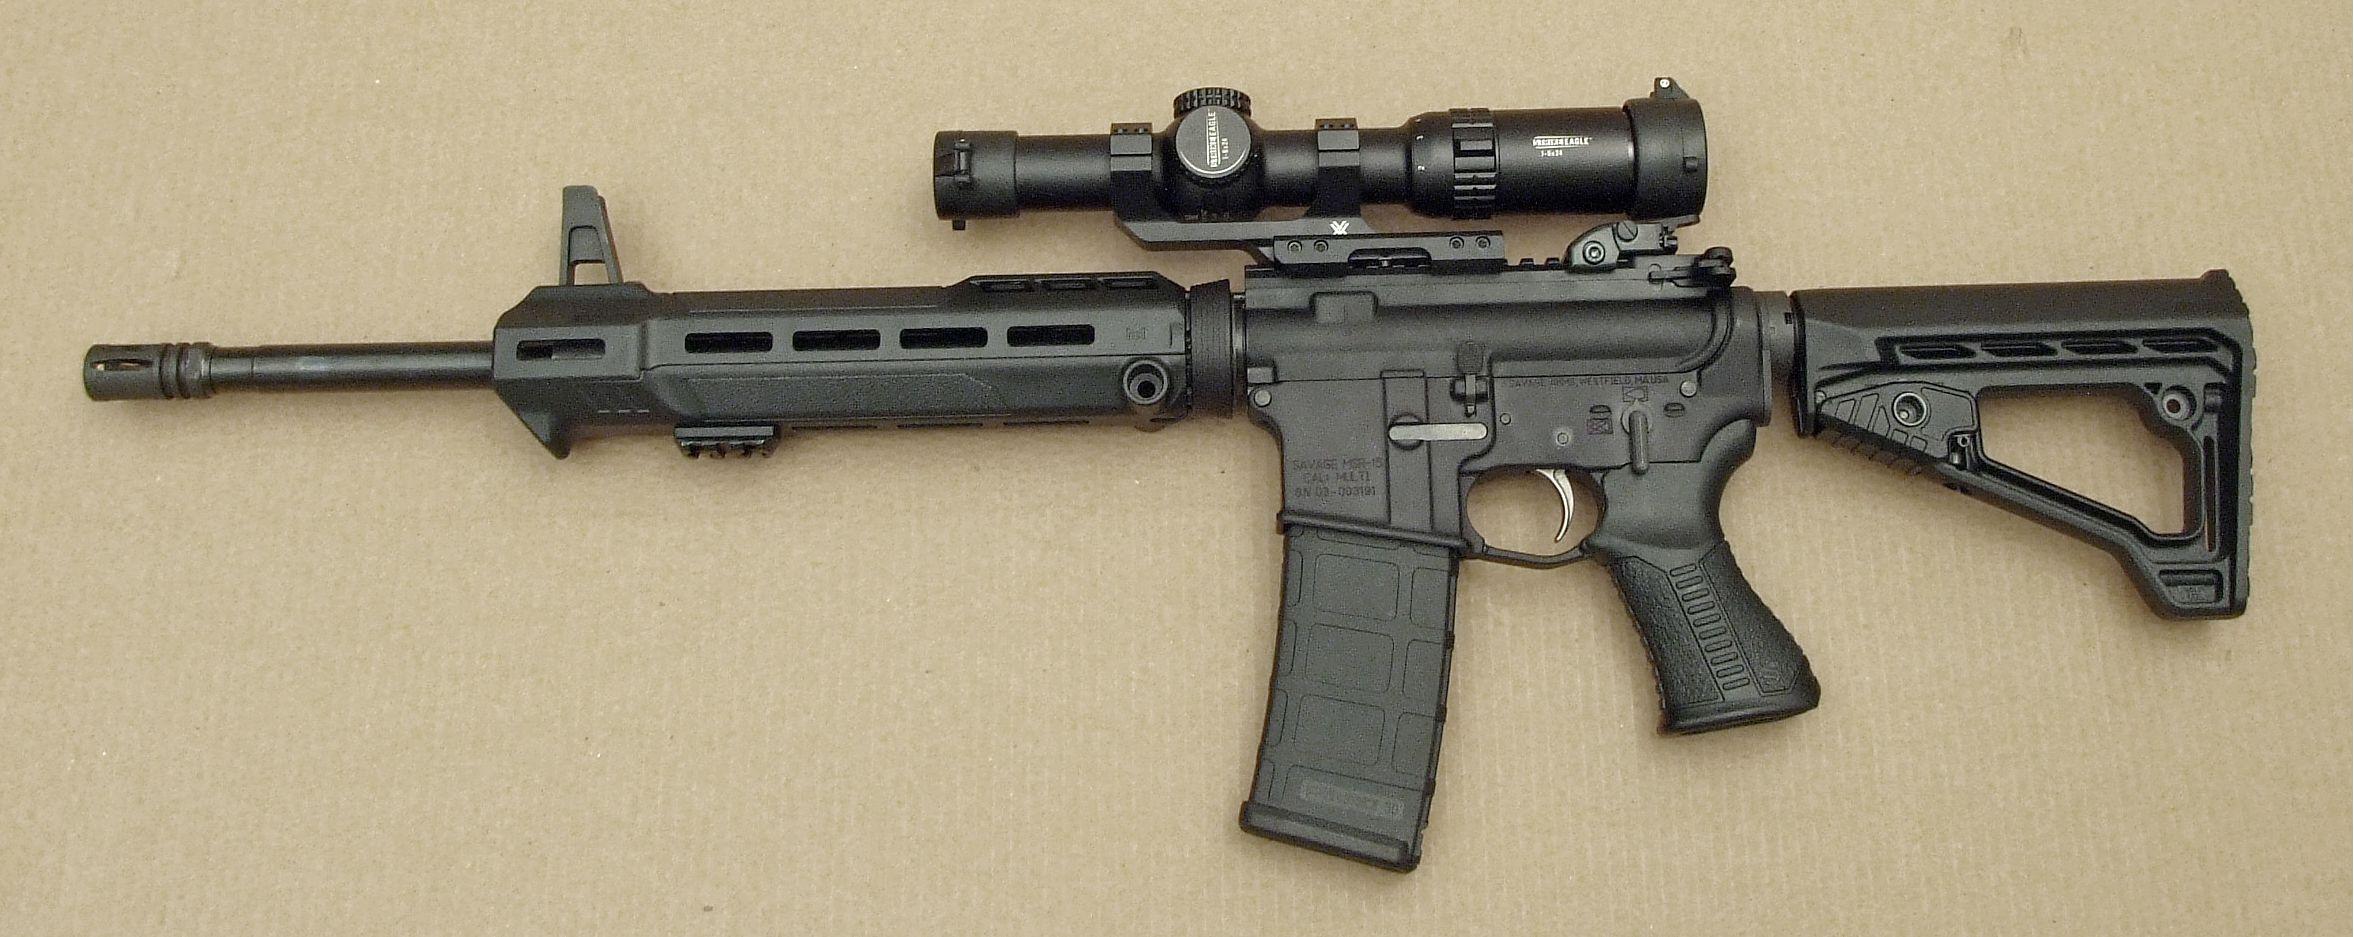 Savage MSR 15 Patrol z optyką Vortex